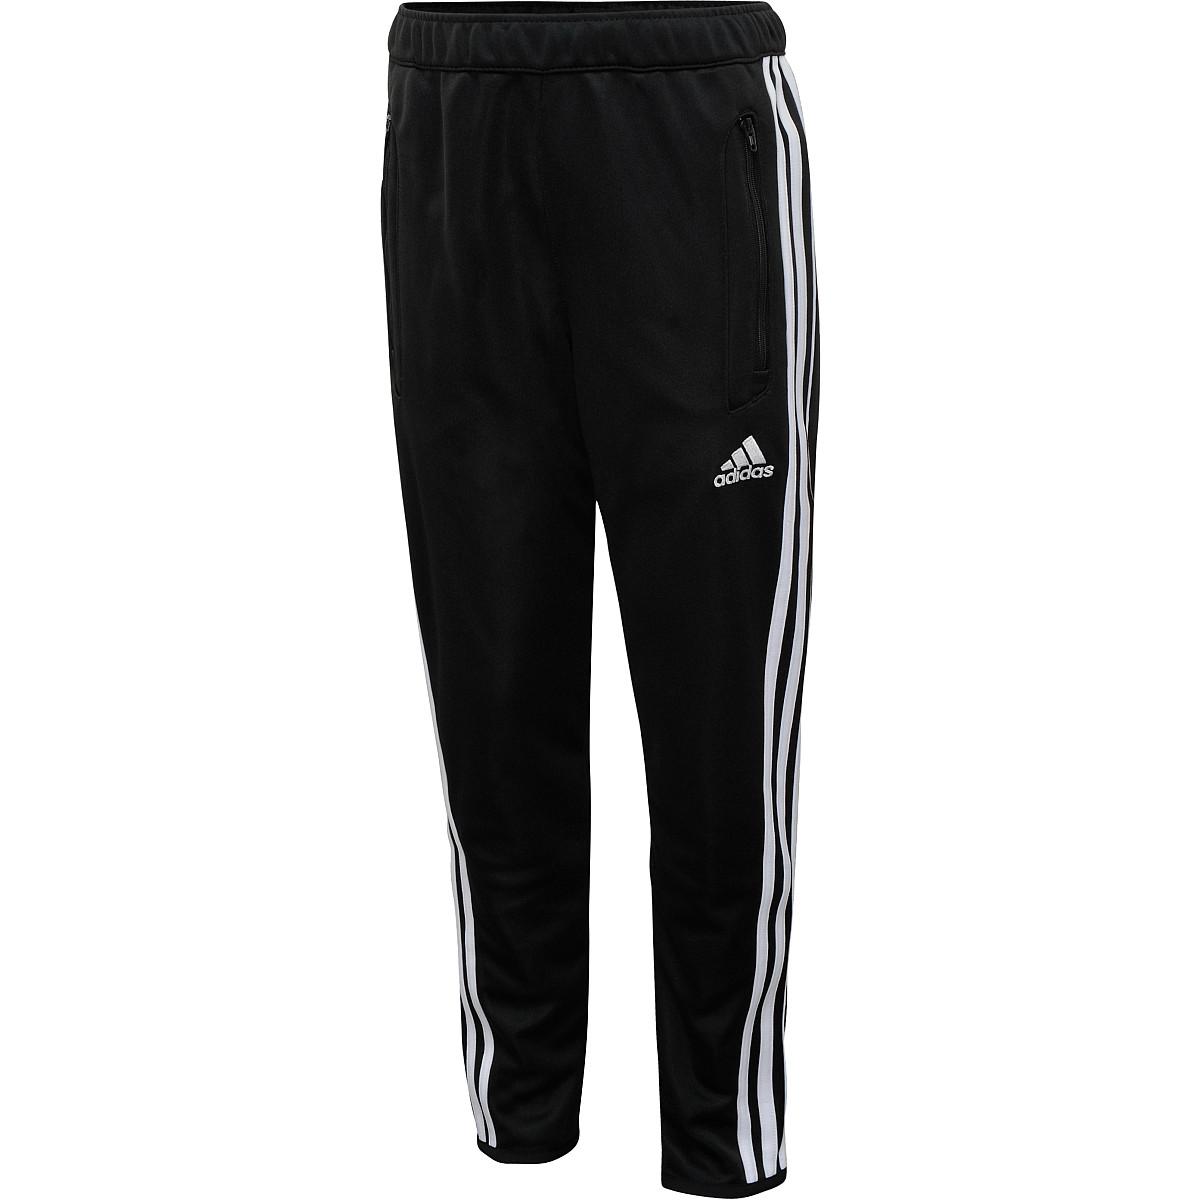 Adidas boys' tiro 13 training soccer pants